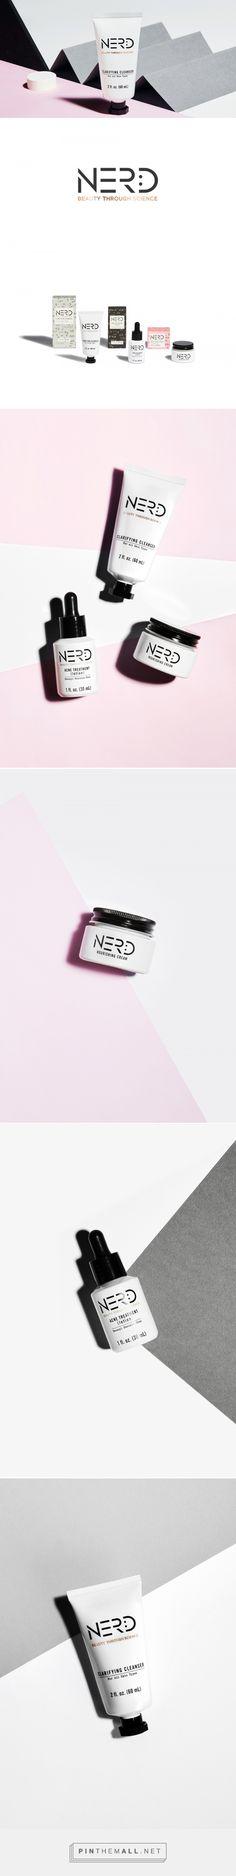 NERD Skincare Branding and Packaging by Pearlfisher | Fivestar Branding – Design and Branding Agency & Inspiration Gallery | #PackagingInspiration